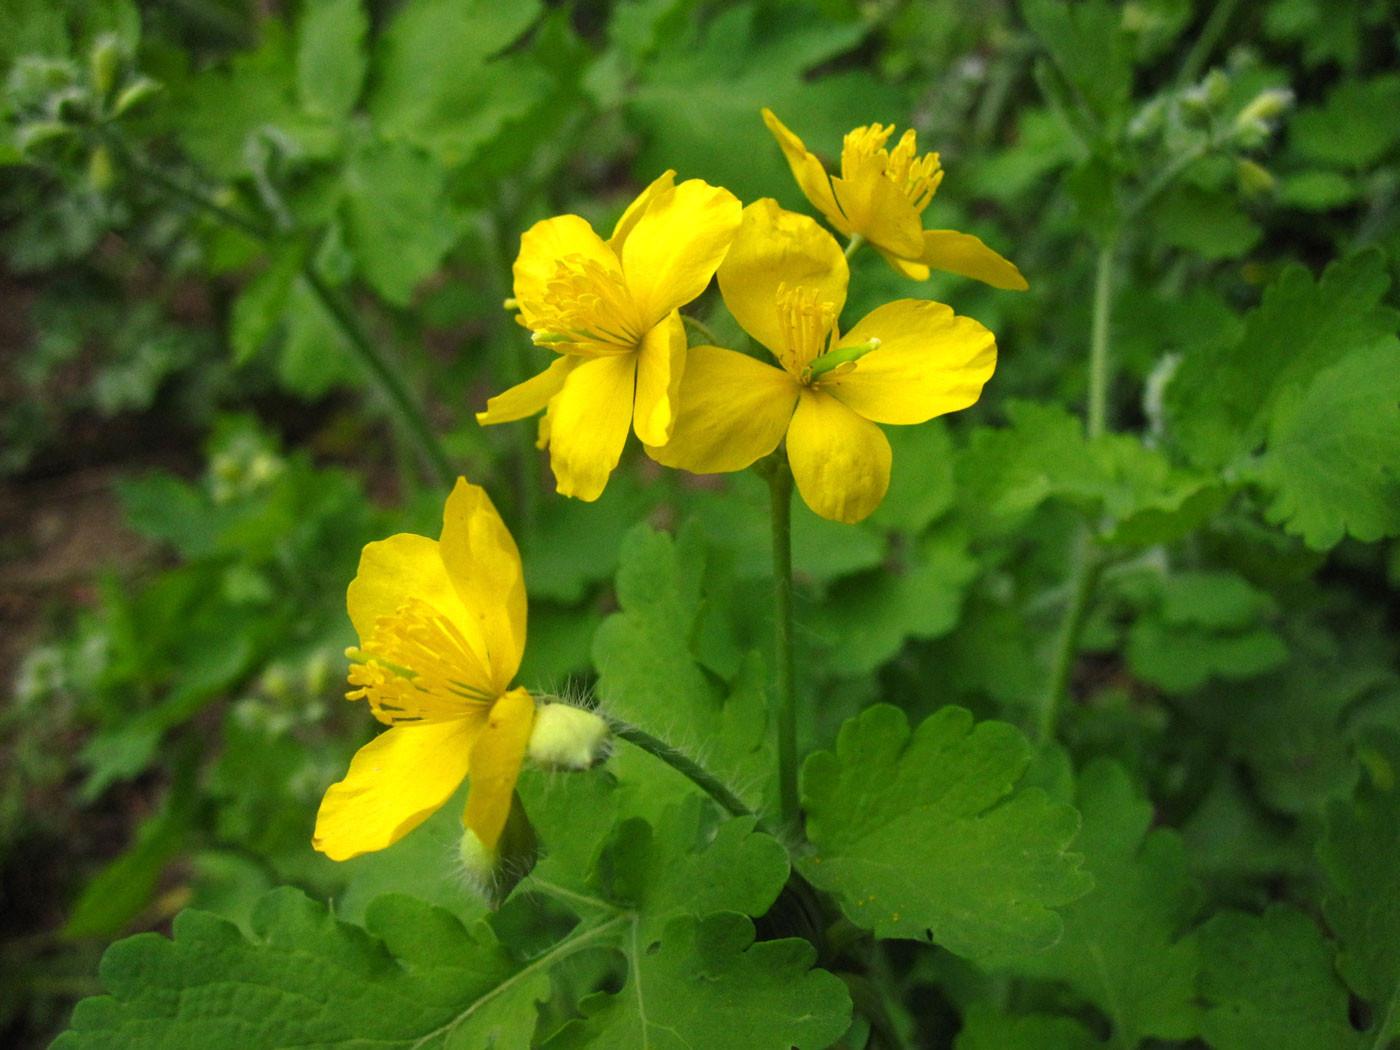 Schöllkraut (Chelidonium majus) | MOHNGEWÄCHSE (Papaveraceae) | giftig!